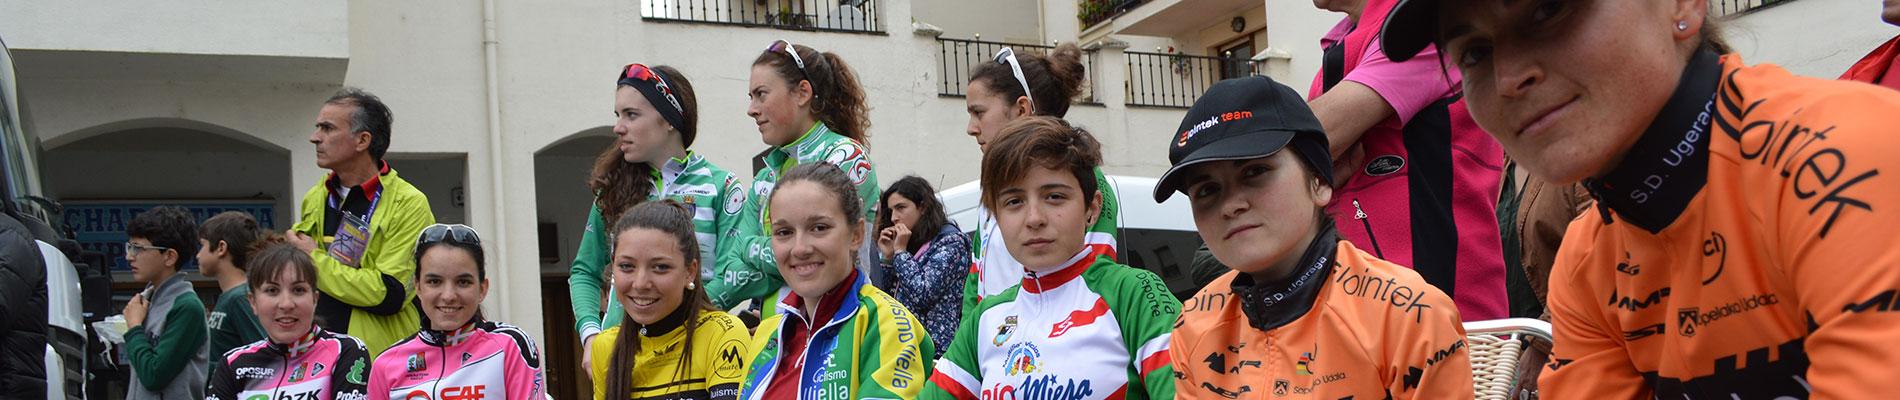 Foto de la I Vuelta a Burgos Féminas